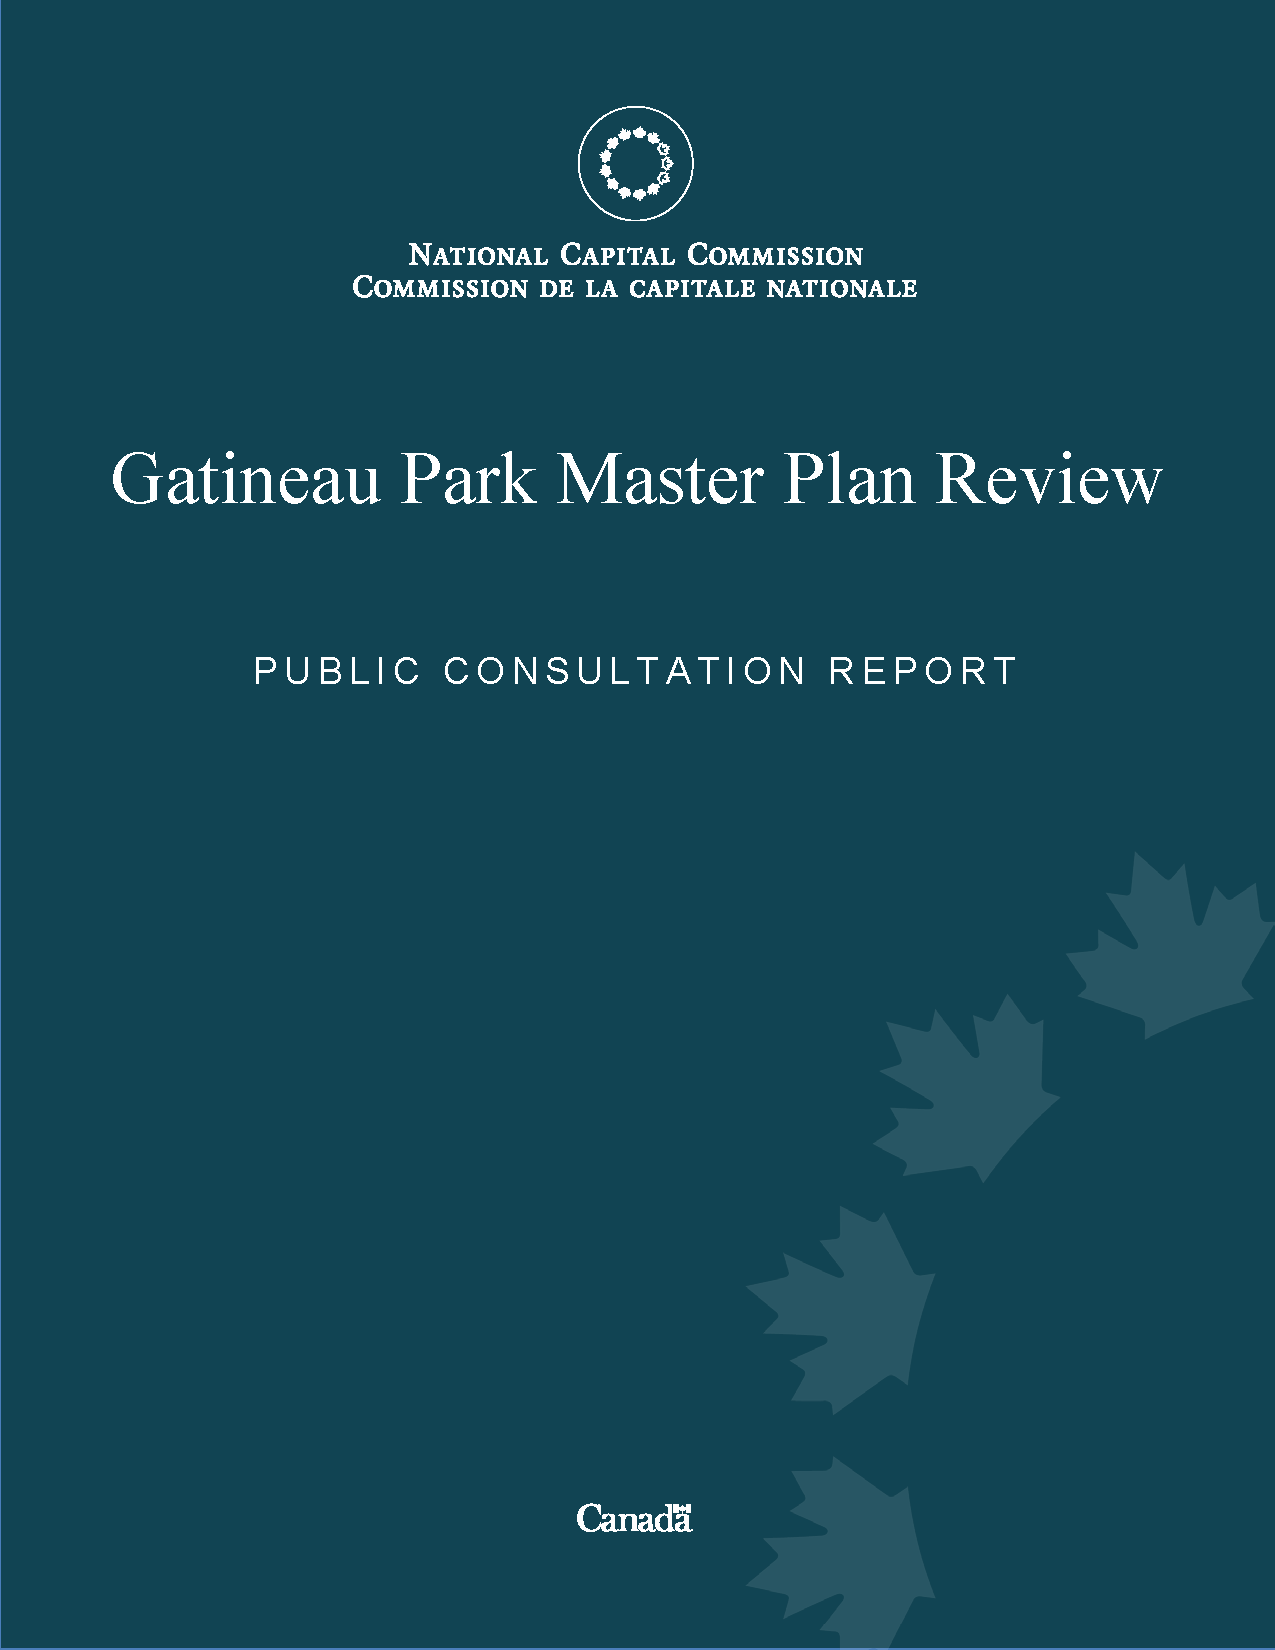 Gatineau Park Master Plan Review - Public Consultation Report Phase 2